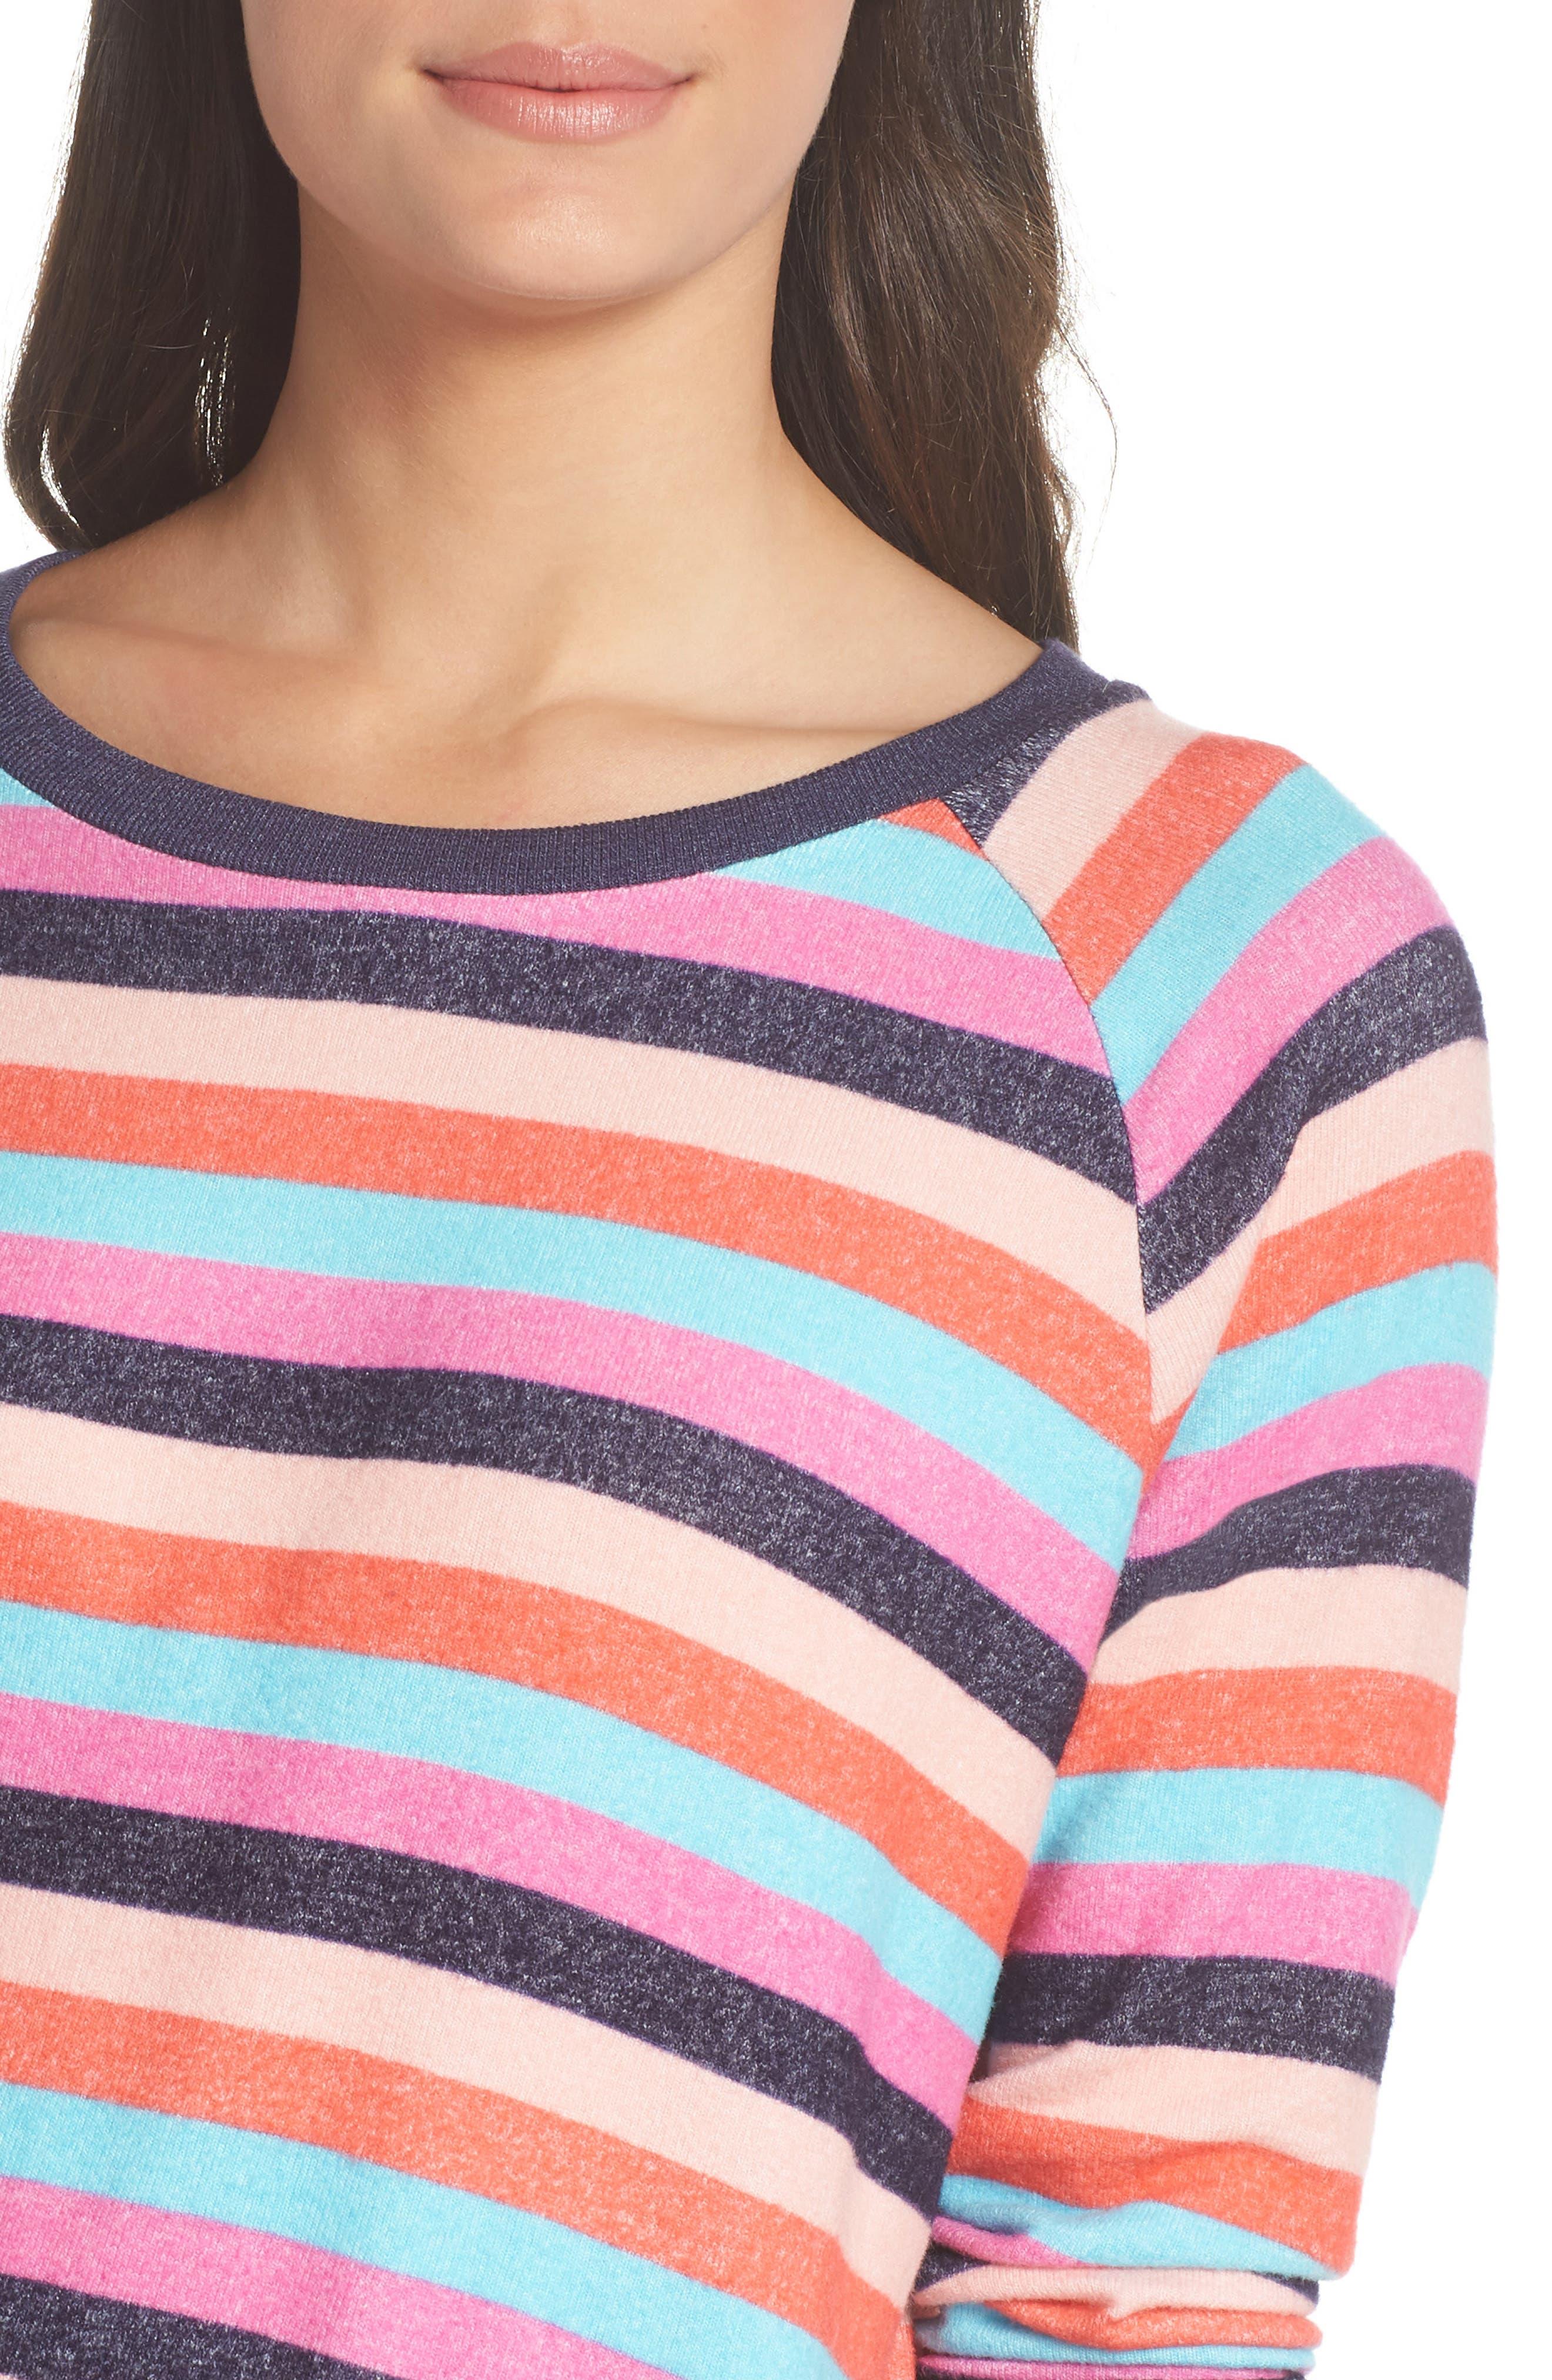 Cozy Crew Raglan Sweatshirt,                             Alternate thumbnail 4, color,                             Navy Dusk Milli Multi Stripe